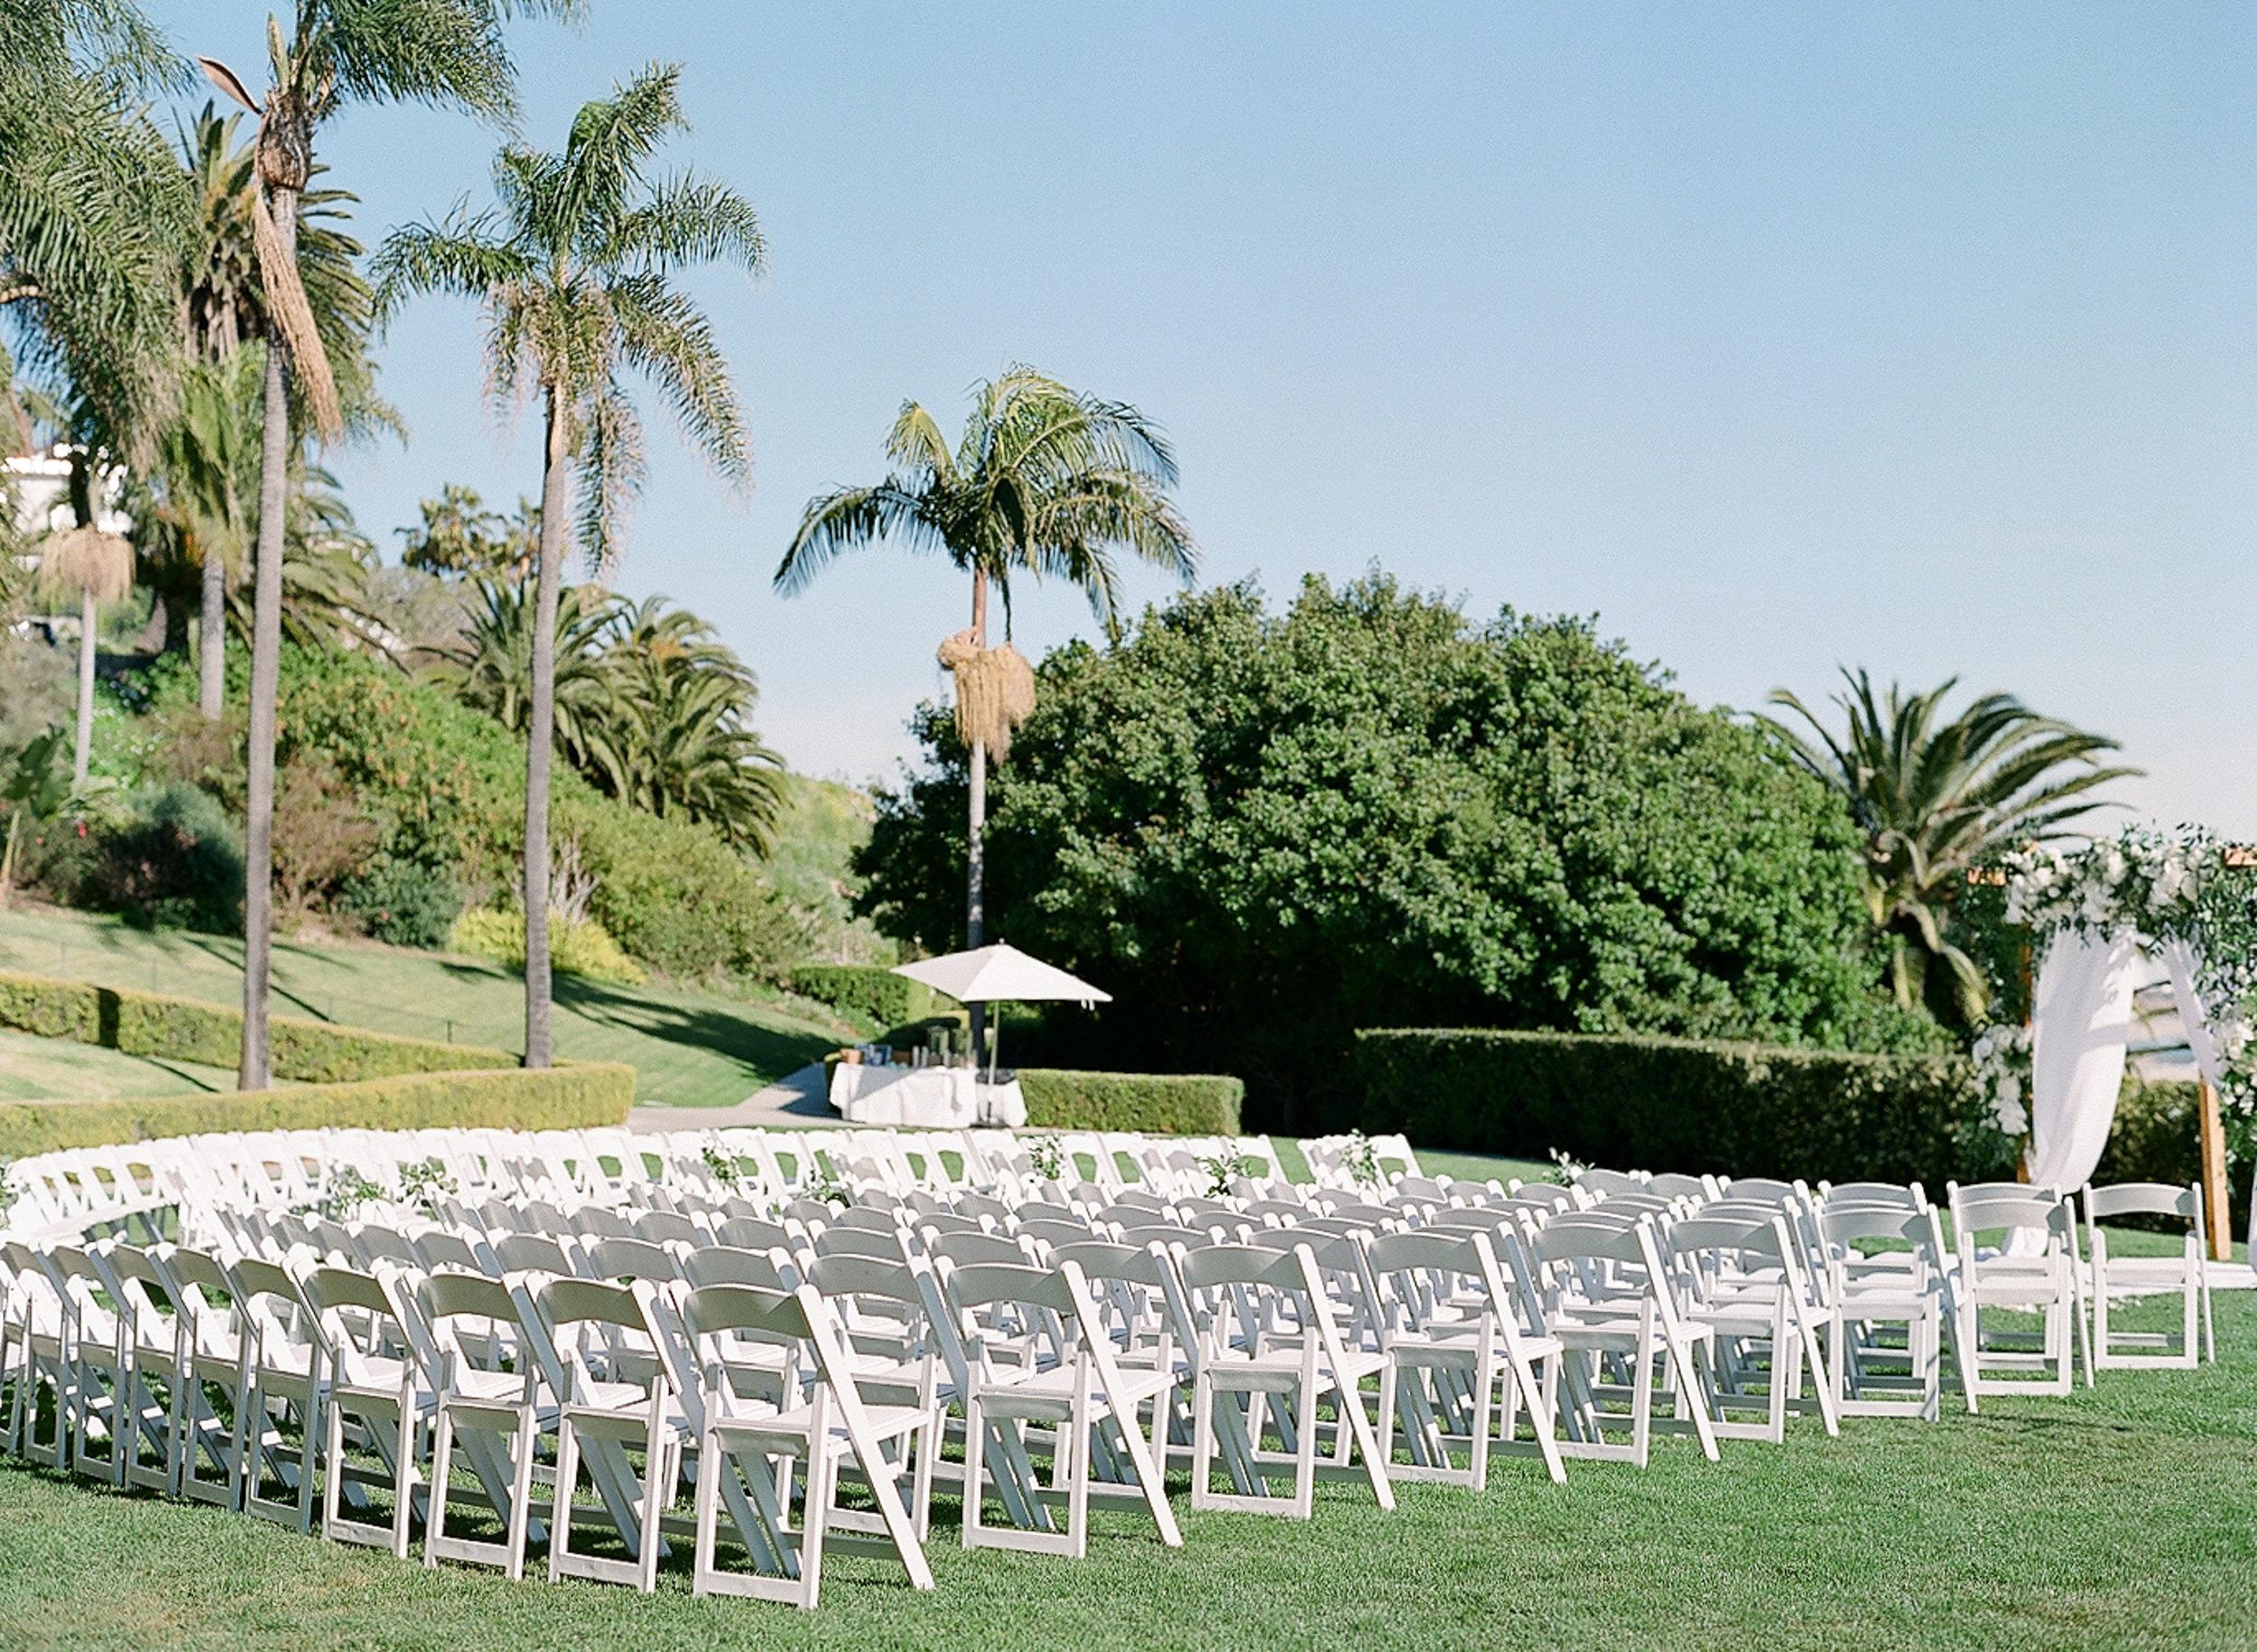 Bonphotage Chicago and California Fine Art Wedding Photography